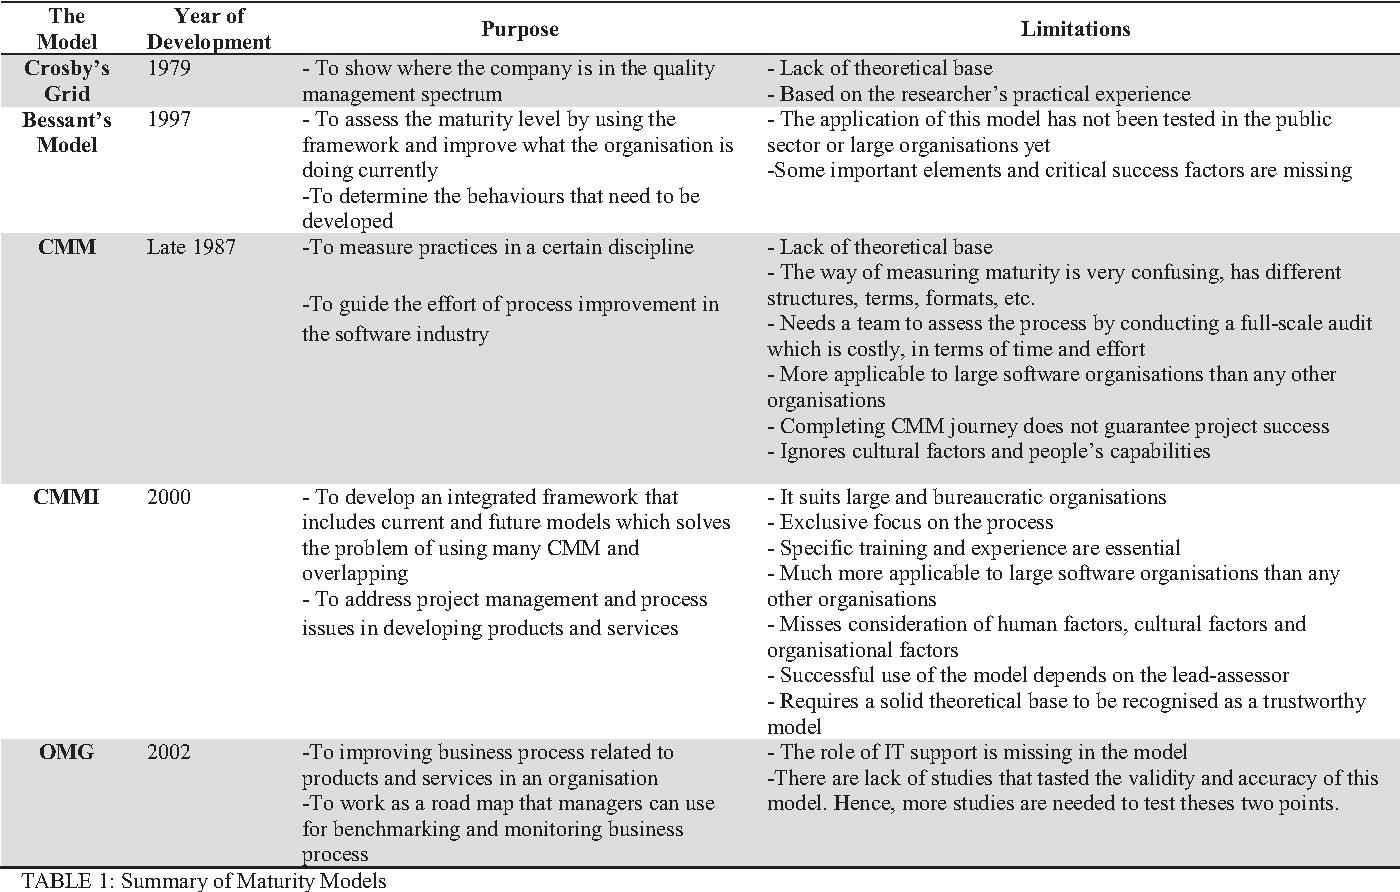 maturity model limitations